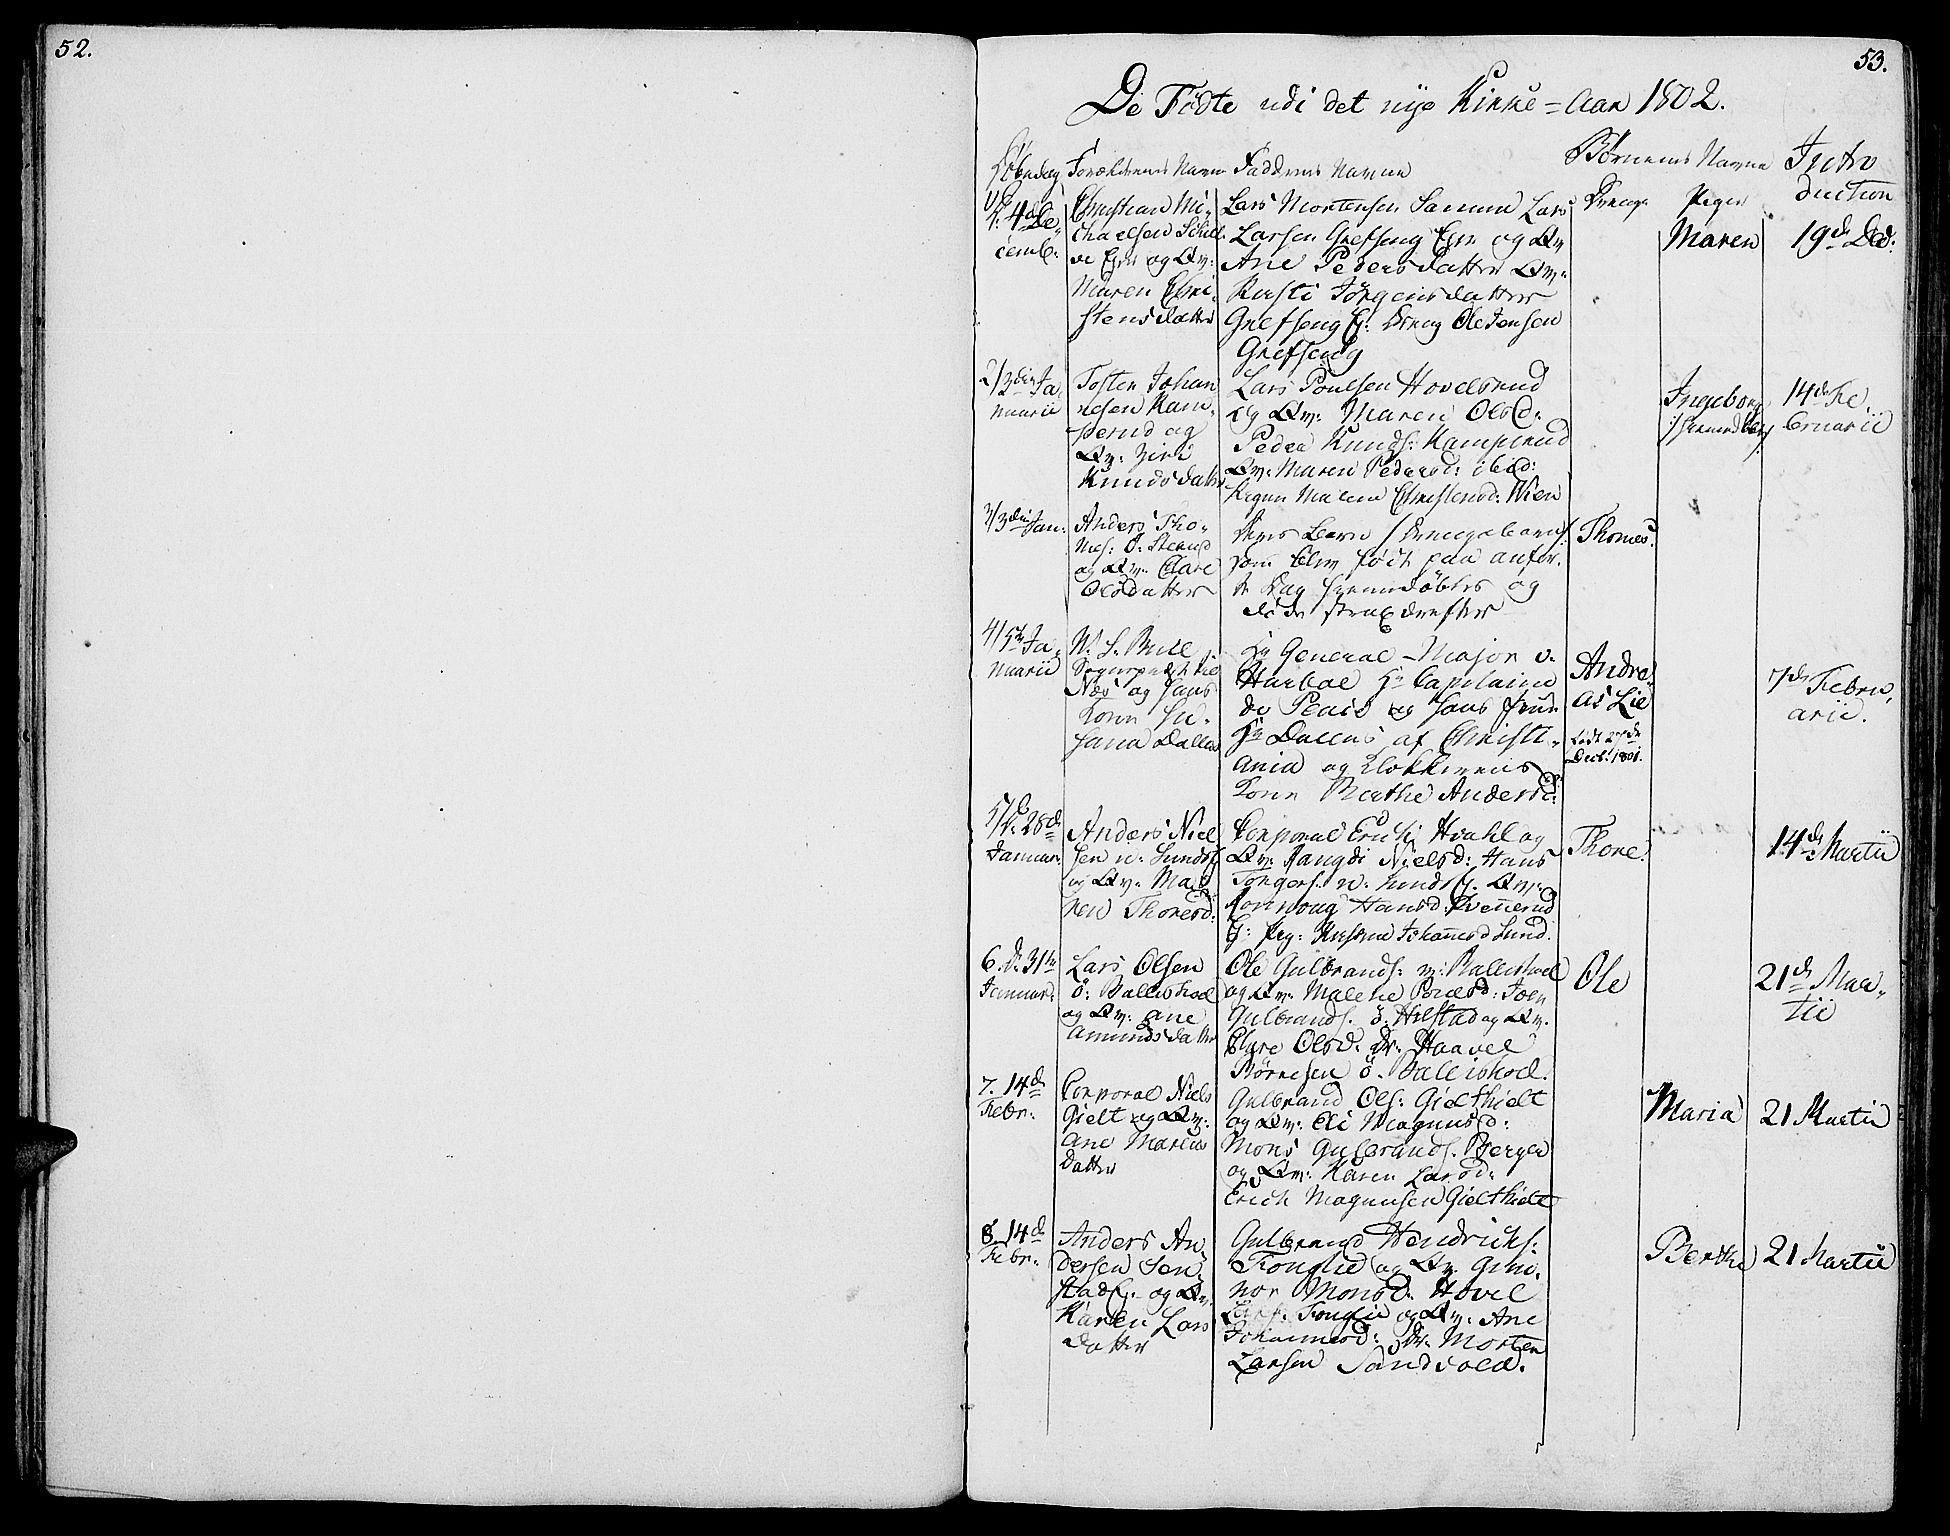 SAH, Nes prestekontor, K/Ka/L0001: Ministerialbok nr. 1, 1802-1814, s. 52-53